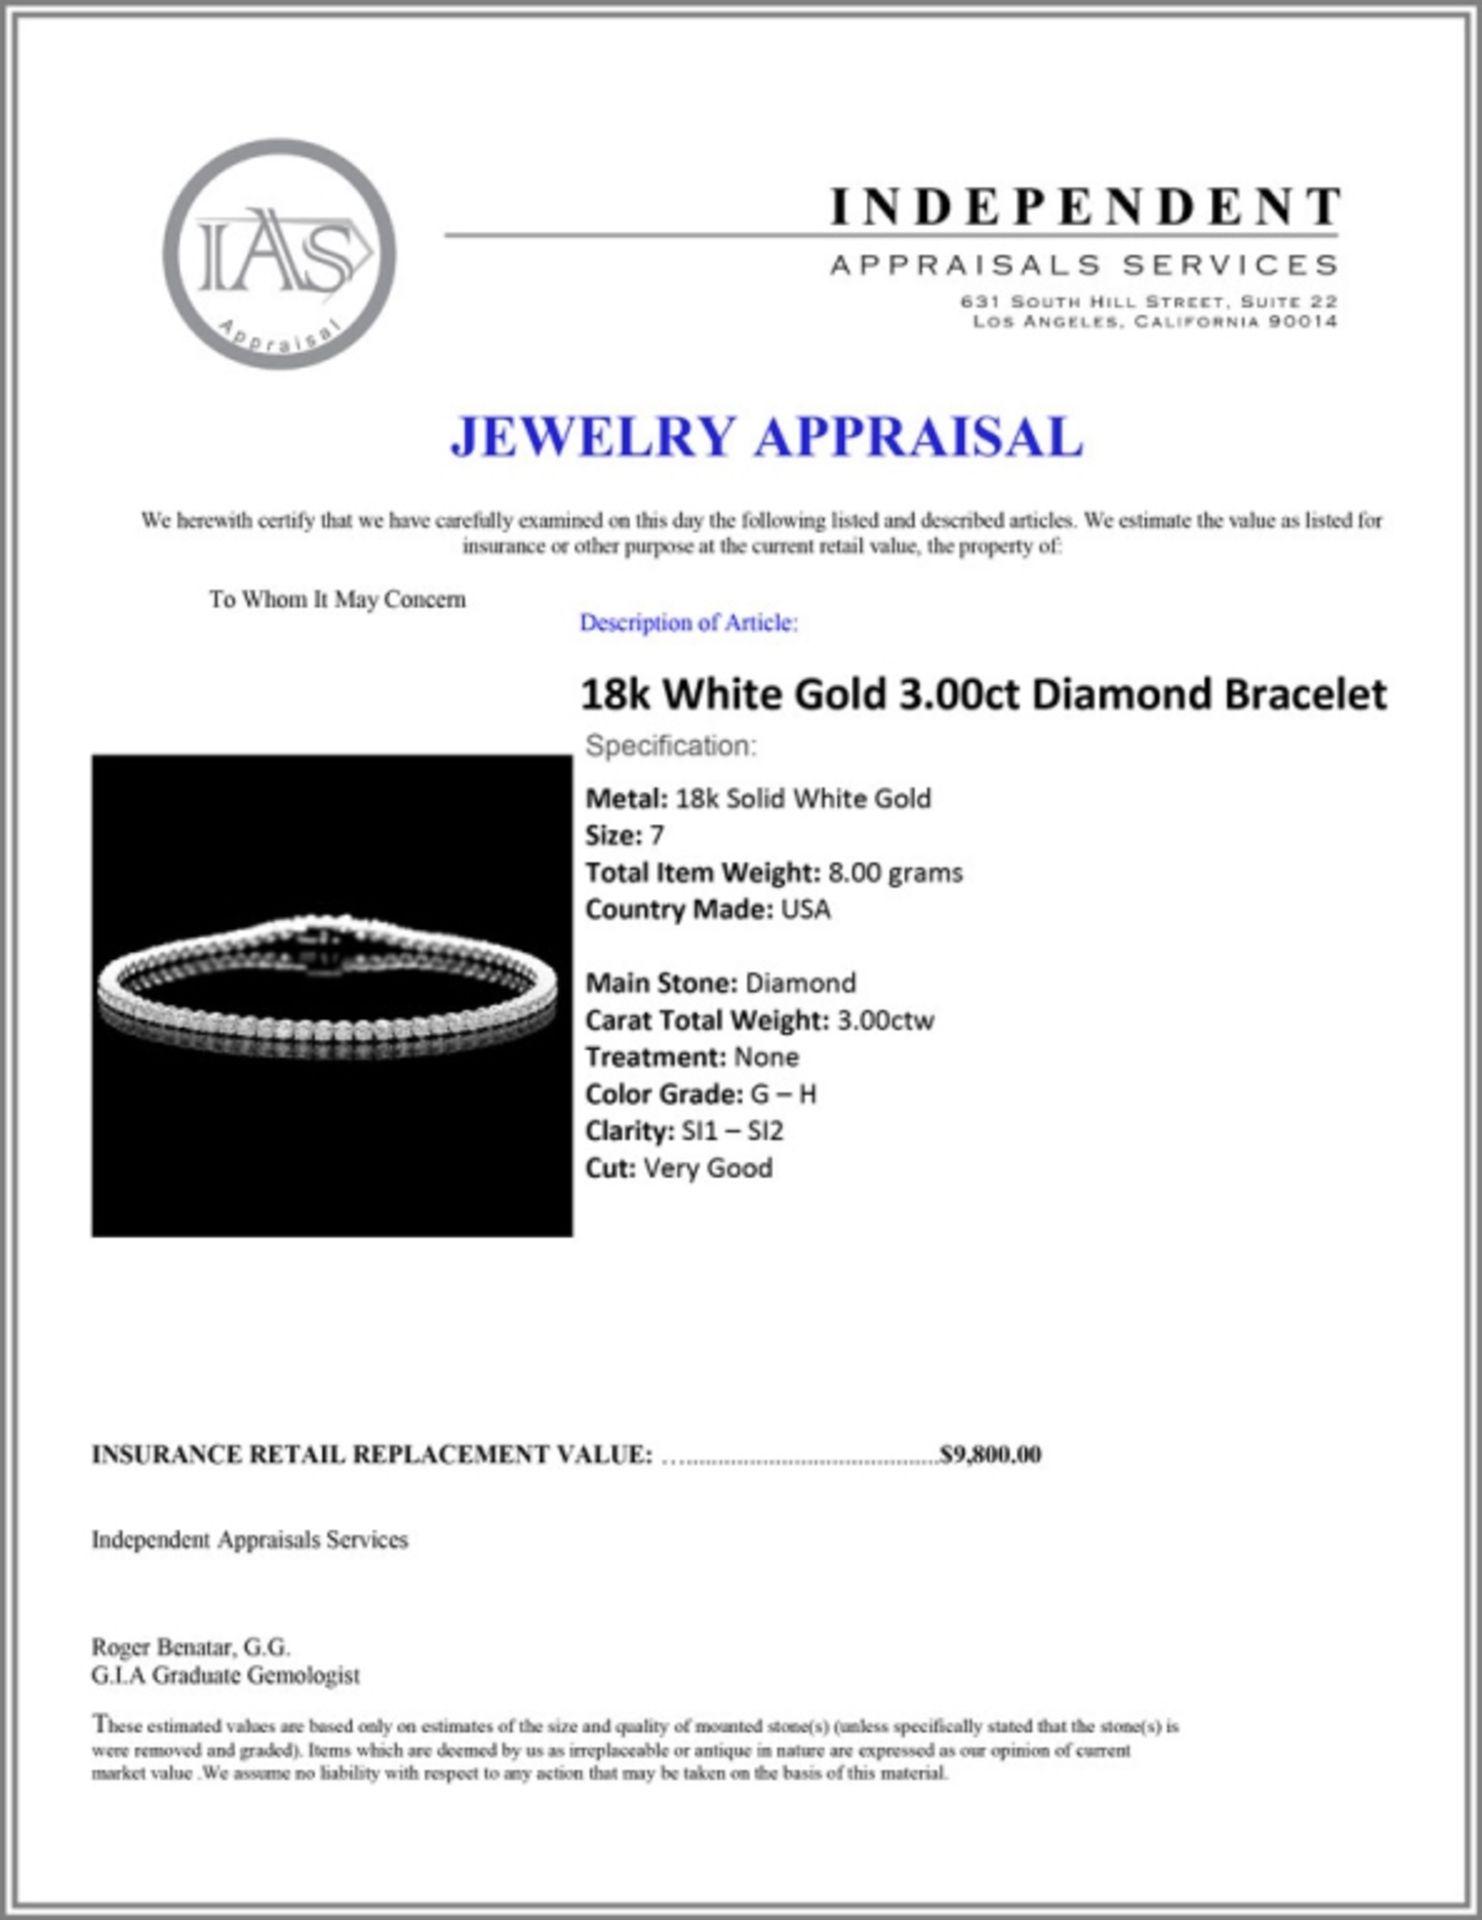 18k White Gold 3.00ct Diamond Bracelet - Image 4 of 4